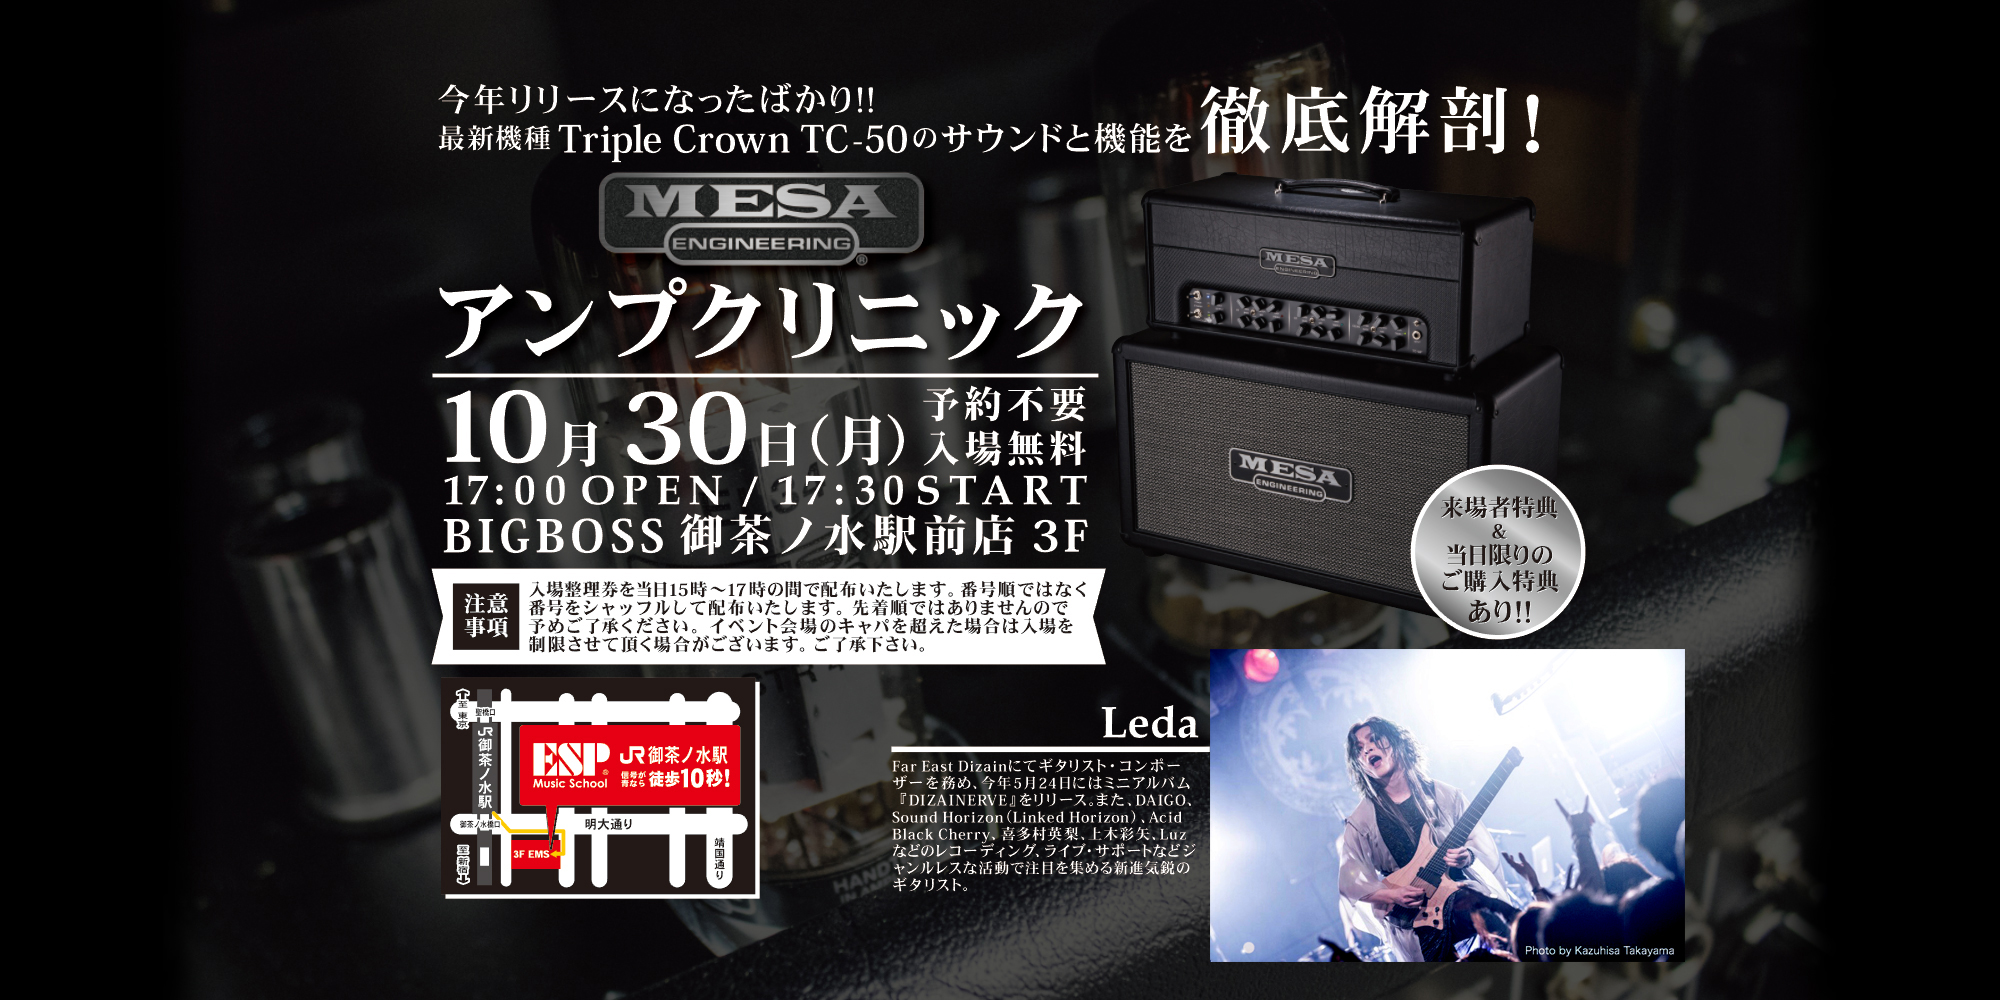 MESA/Boogie アンプクリニック開催!